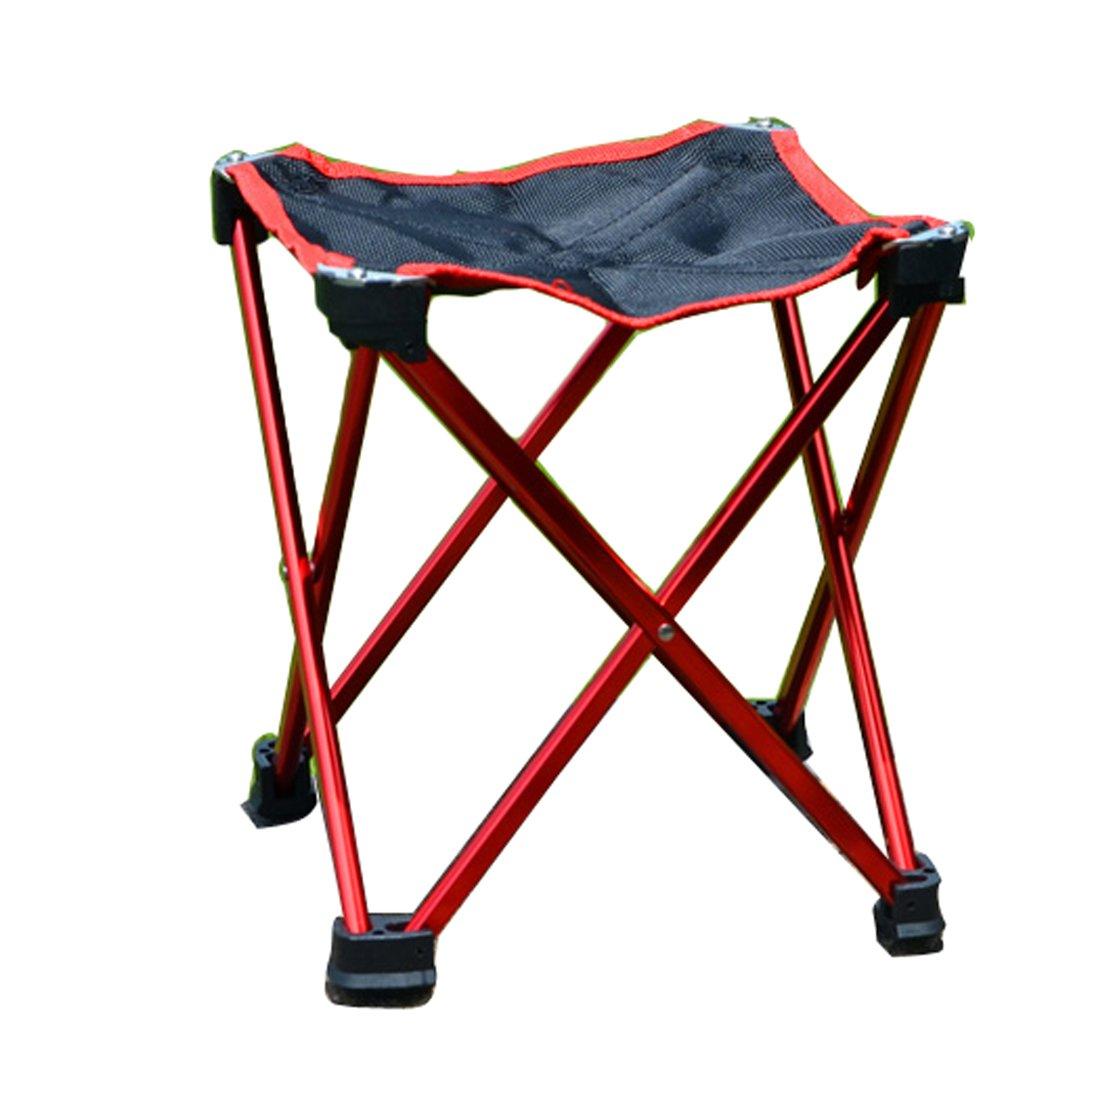 Hi Suyi超軽量ポータブル折りたたみキャンプ椅子スツールforビーチガーデンピクニックアウトドアキャンプ旅行、アルミニウム合金フレーム、anti-tearのオックスフォード布カバー滑り止め足、キャリアバッグ B073XLDQKM  レッド